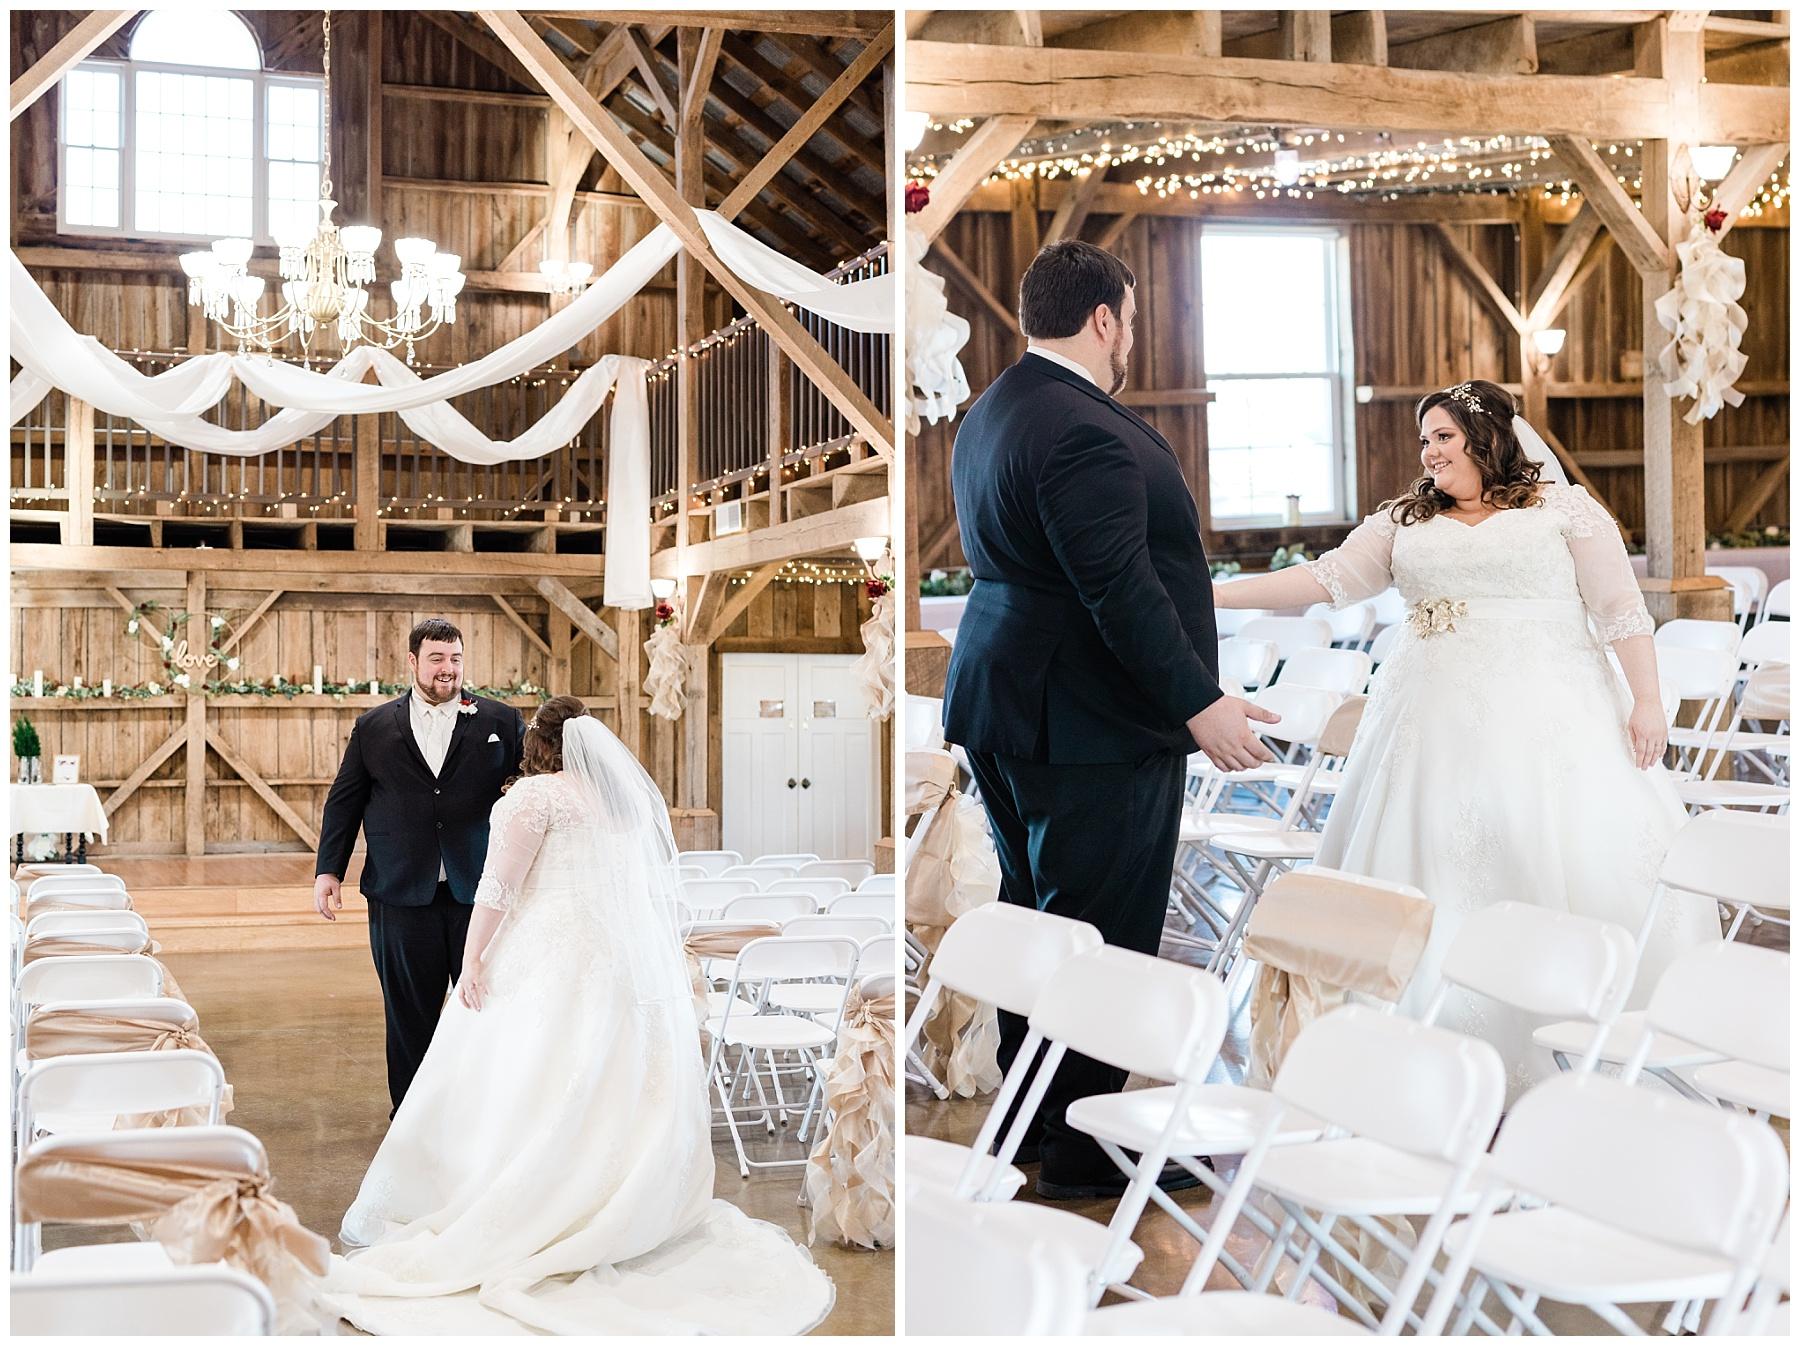 Golden Winter Wedding at The Legacy Barn in Barnett Missouri by Kelsi Kliethermes Photography Columbia Missouri Wedding Photographer_0016.jpg